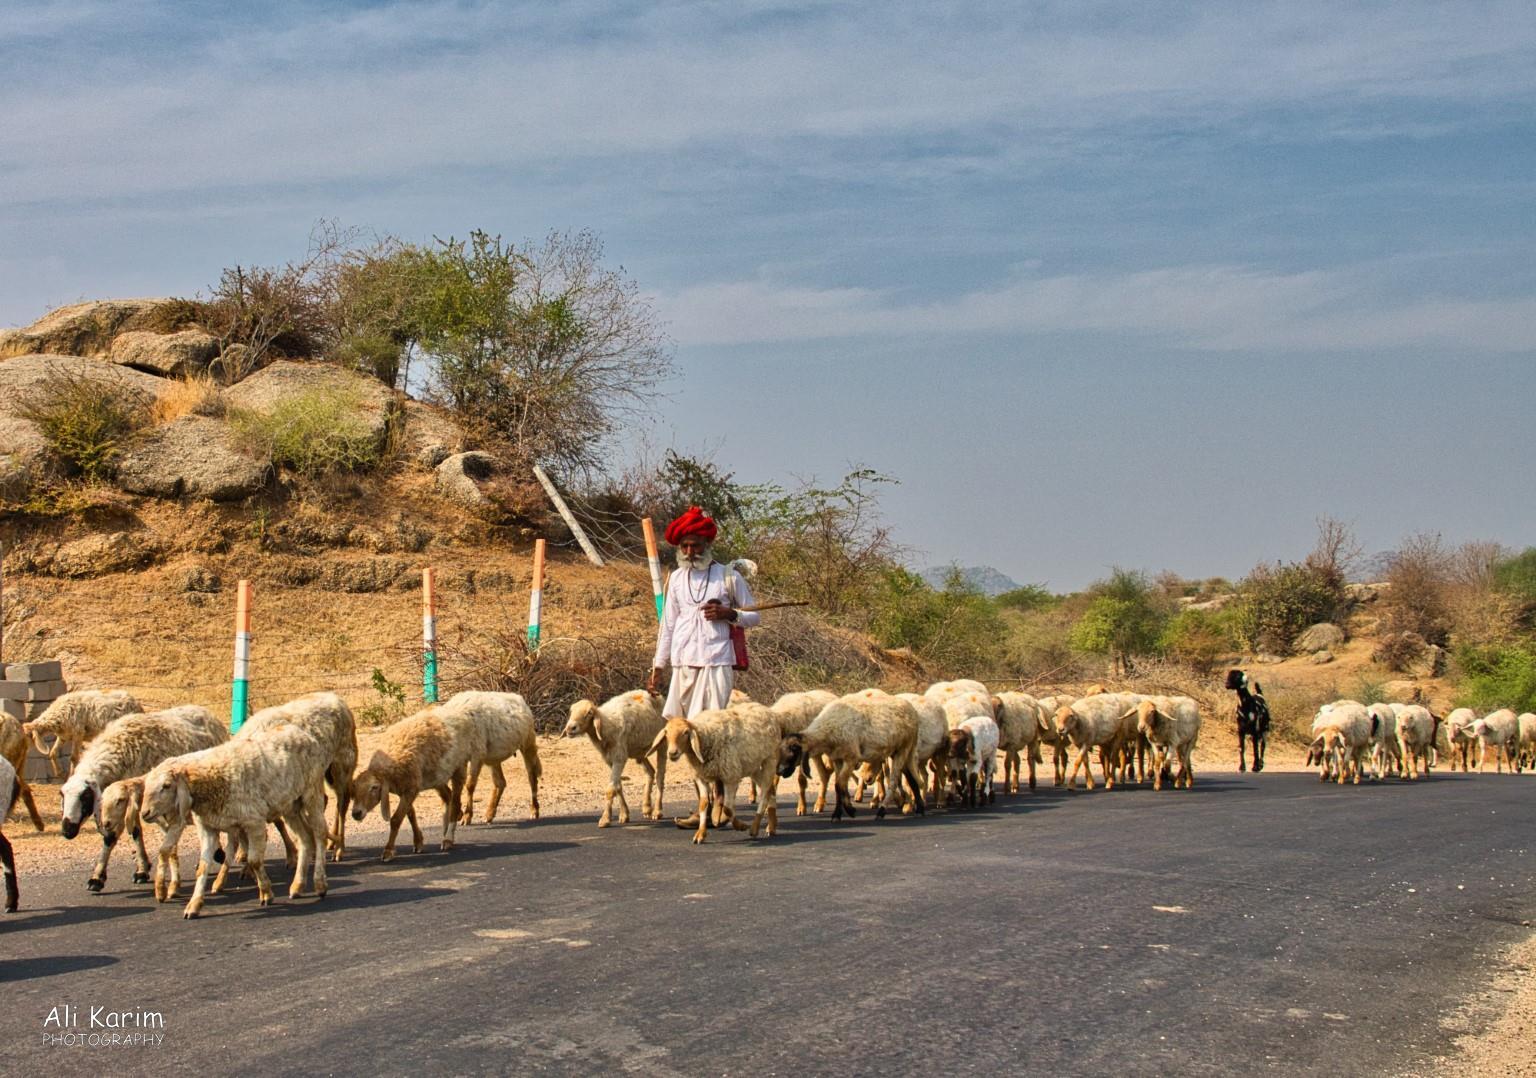 Leopards, Bera, Rajasthan Rabari shepherd and his sheep